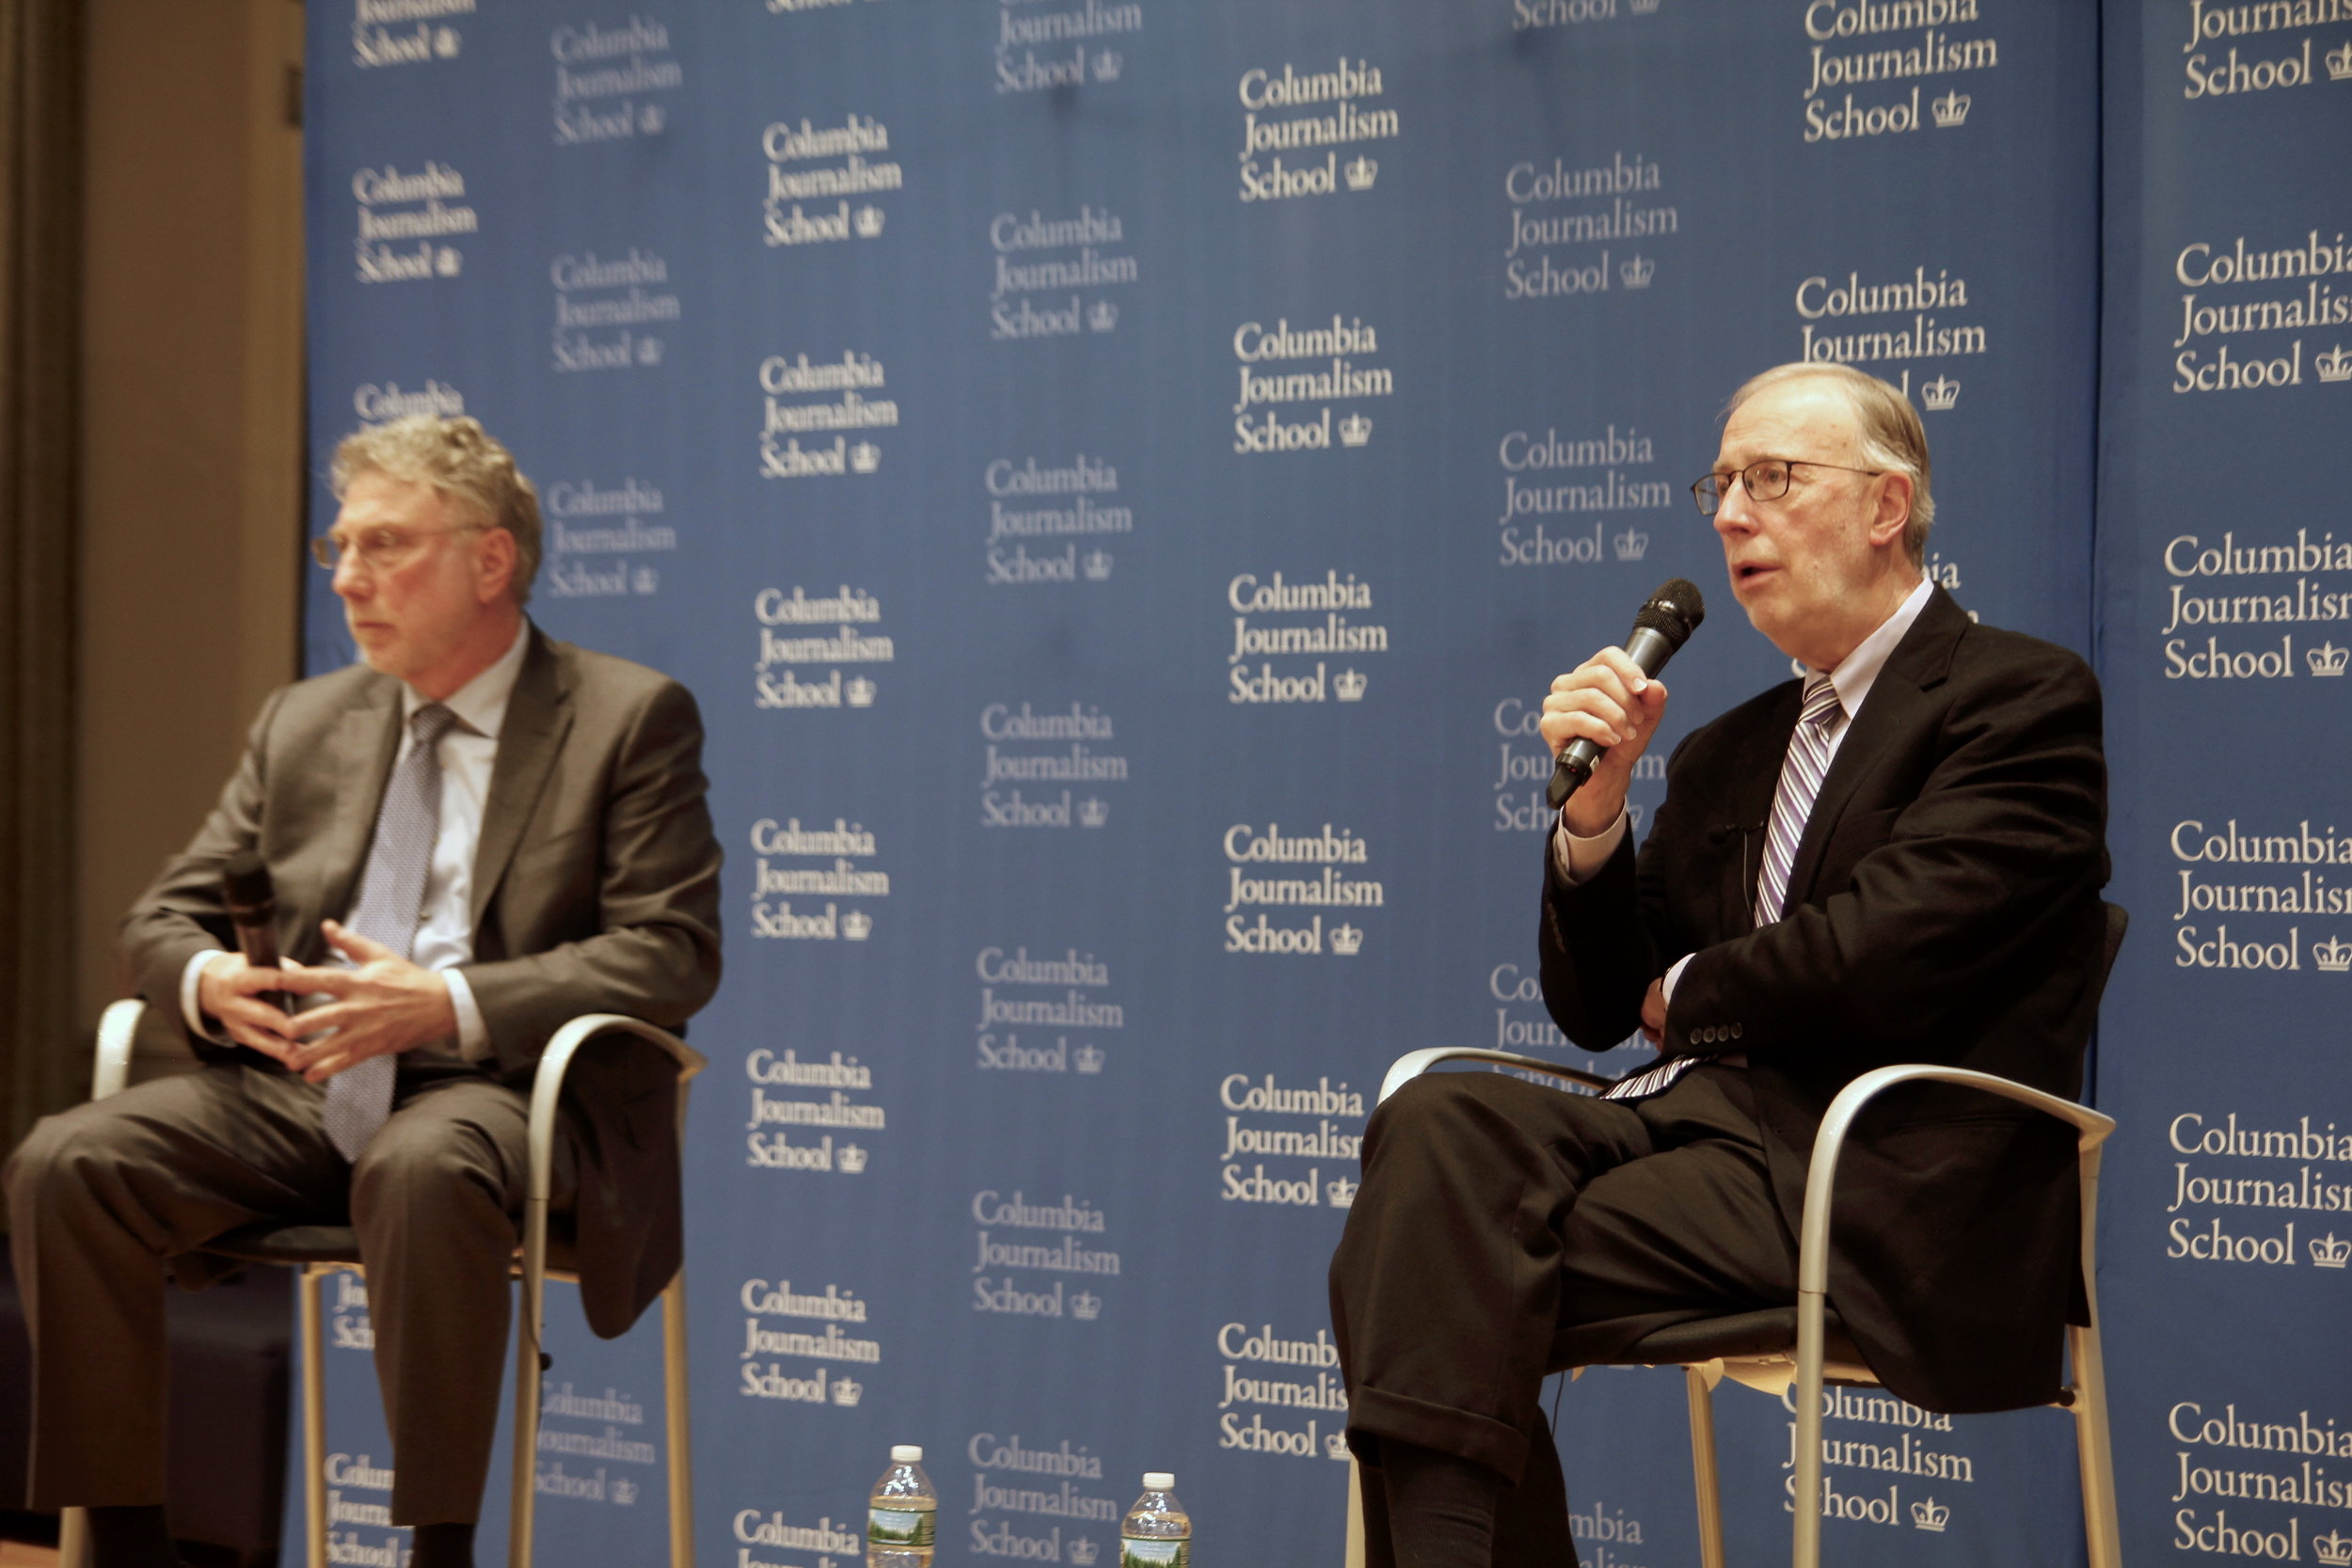 Marty Baron and Dan Balz at the Columbia Journalism School